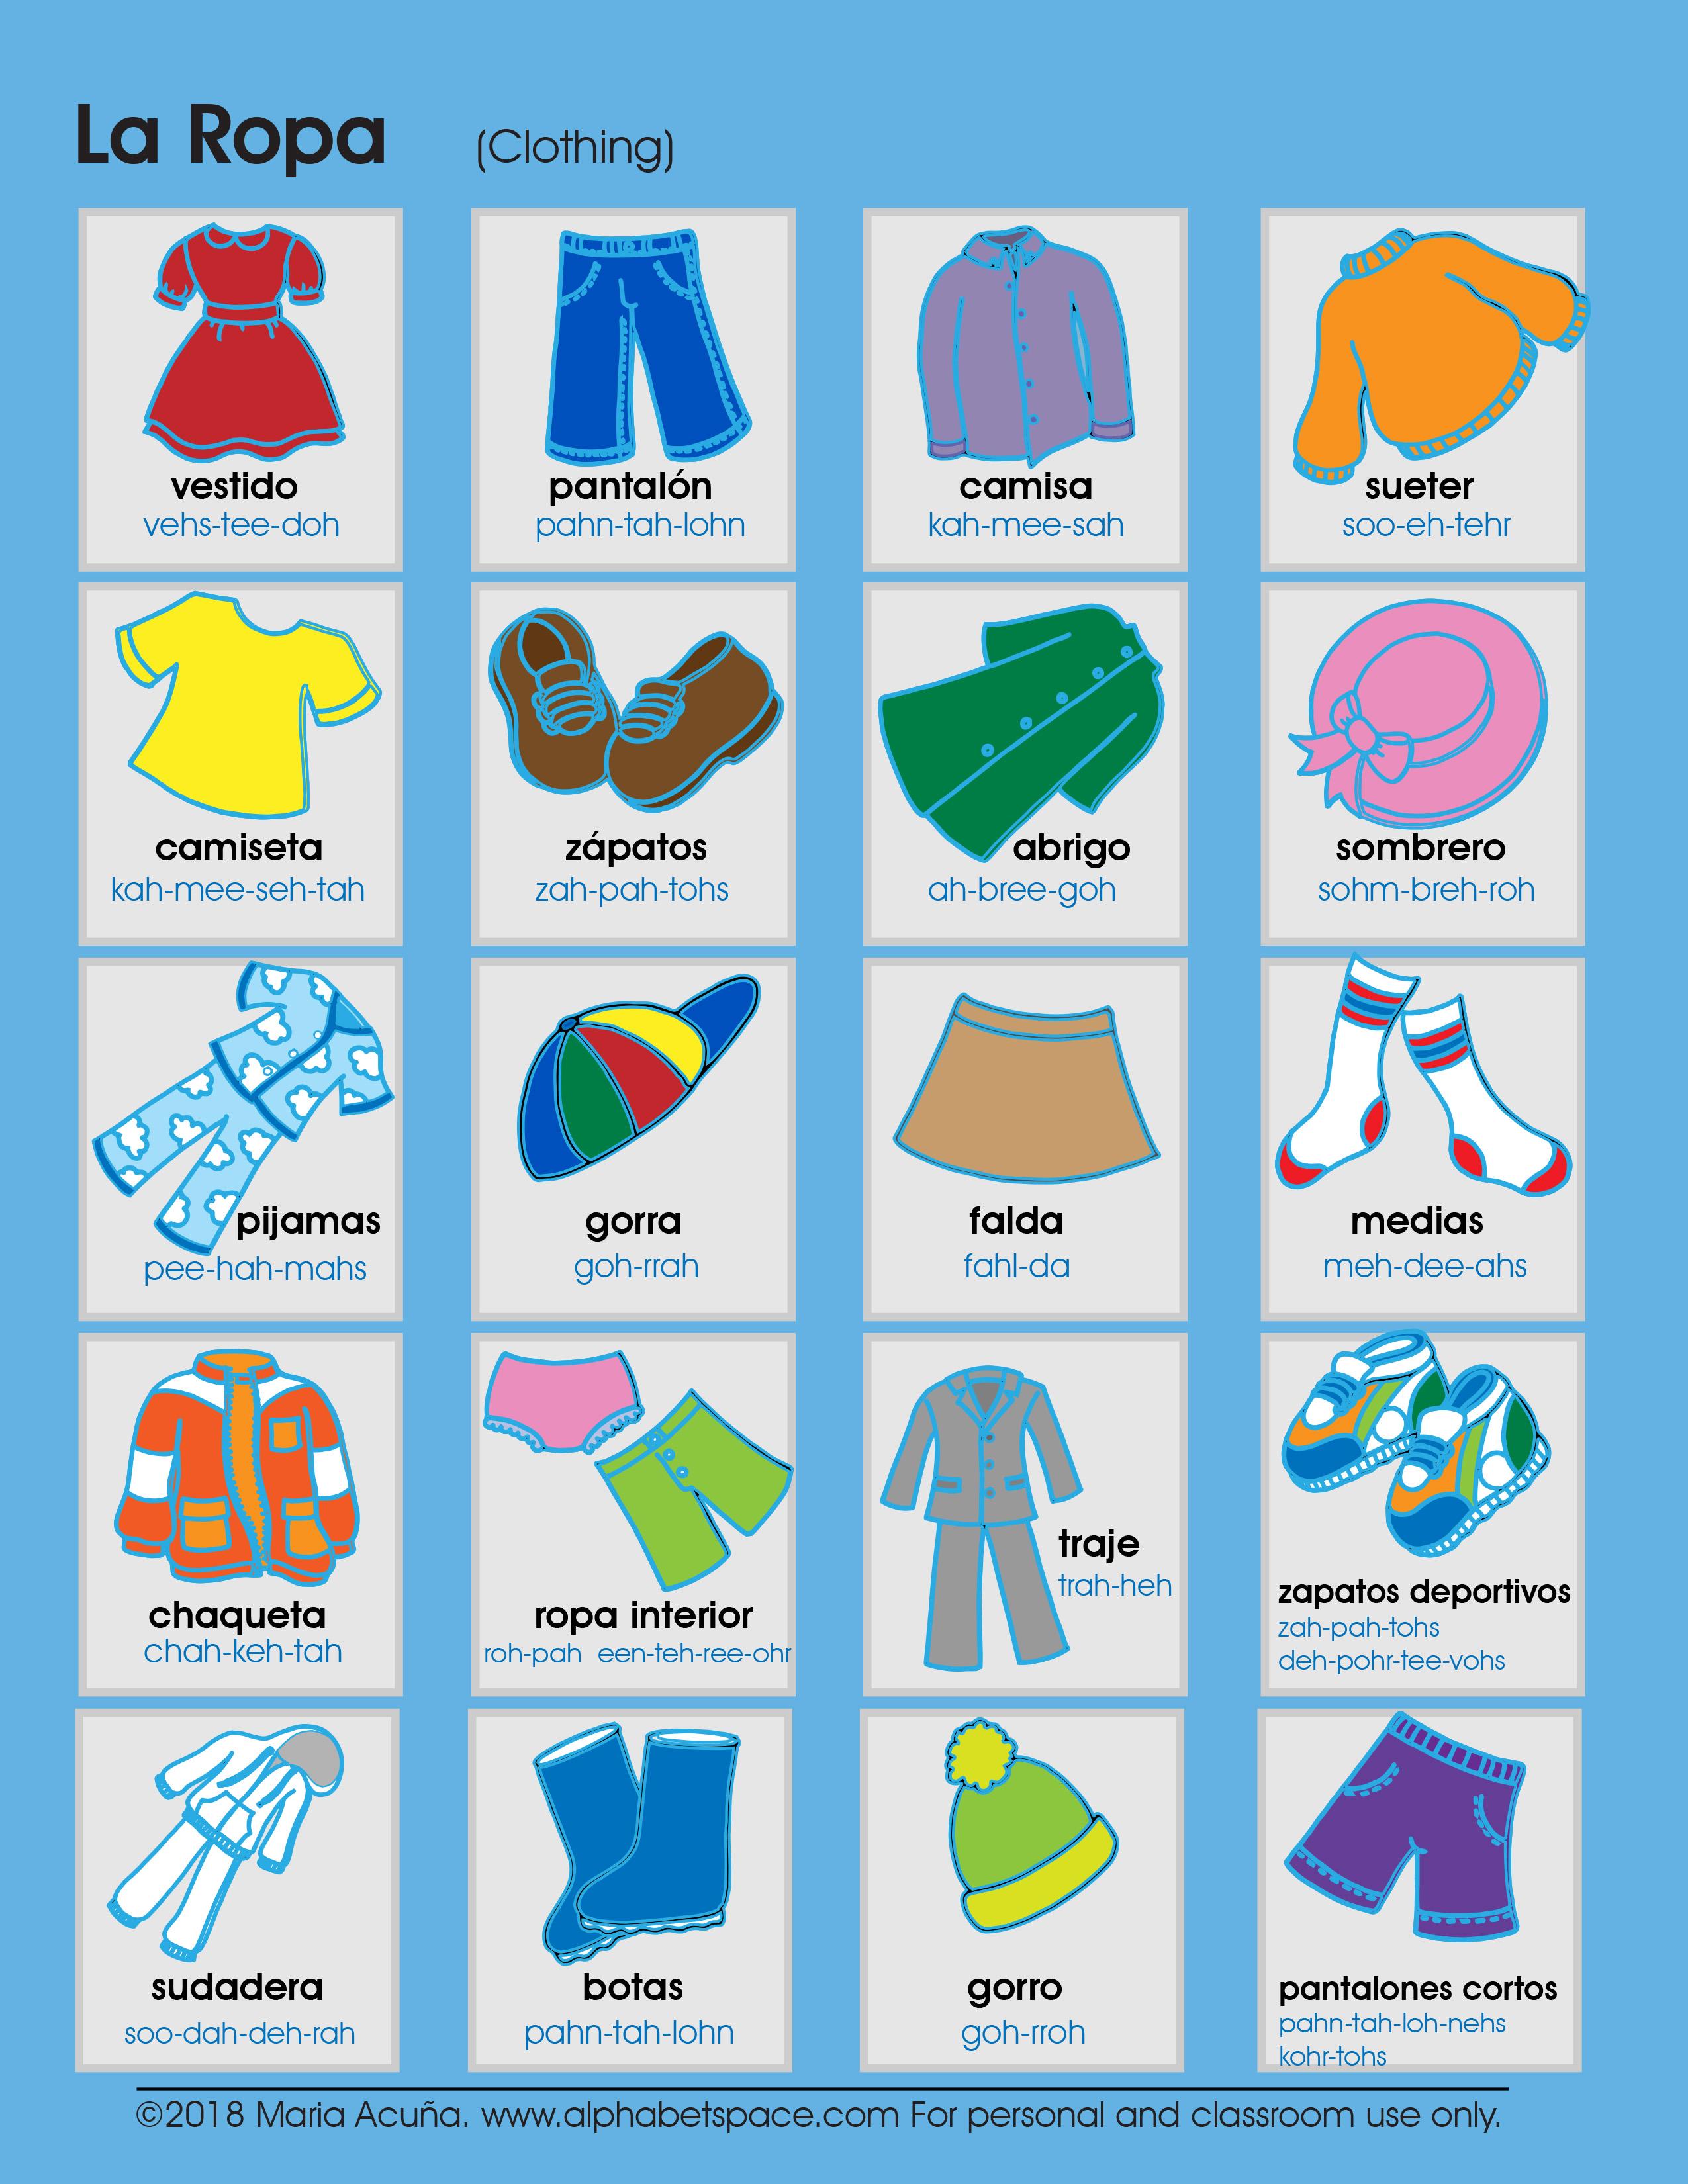 La Ropa Clothing Spanish For Children